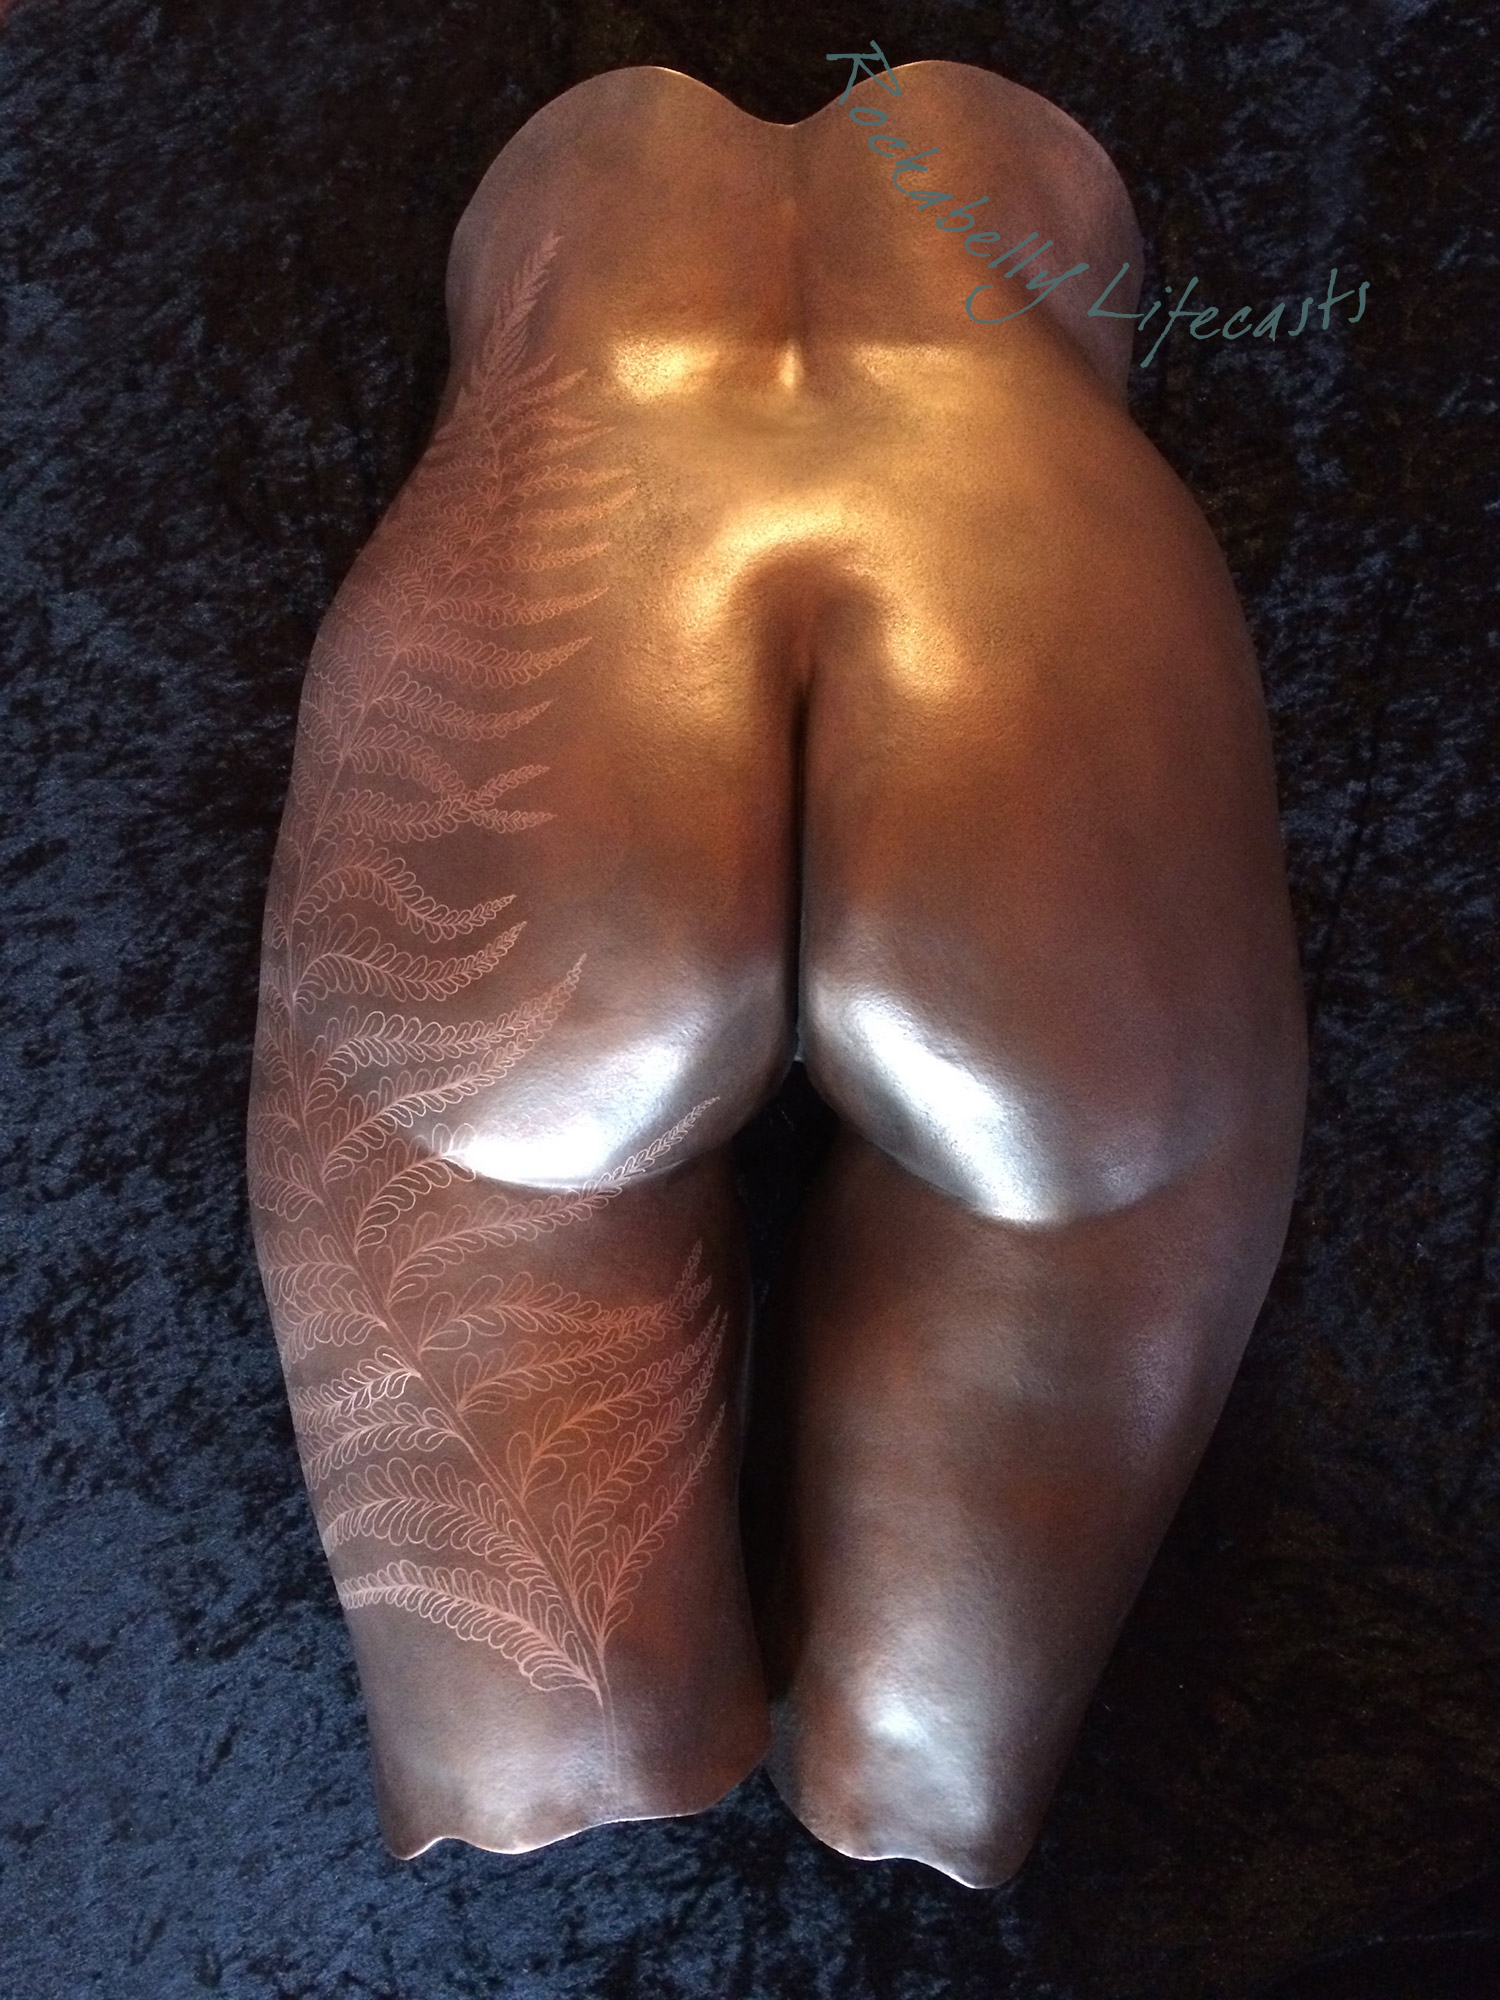 Copper veneer over plaster cast with hand-engraved fern design.